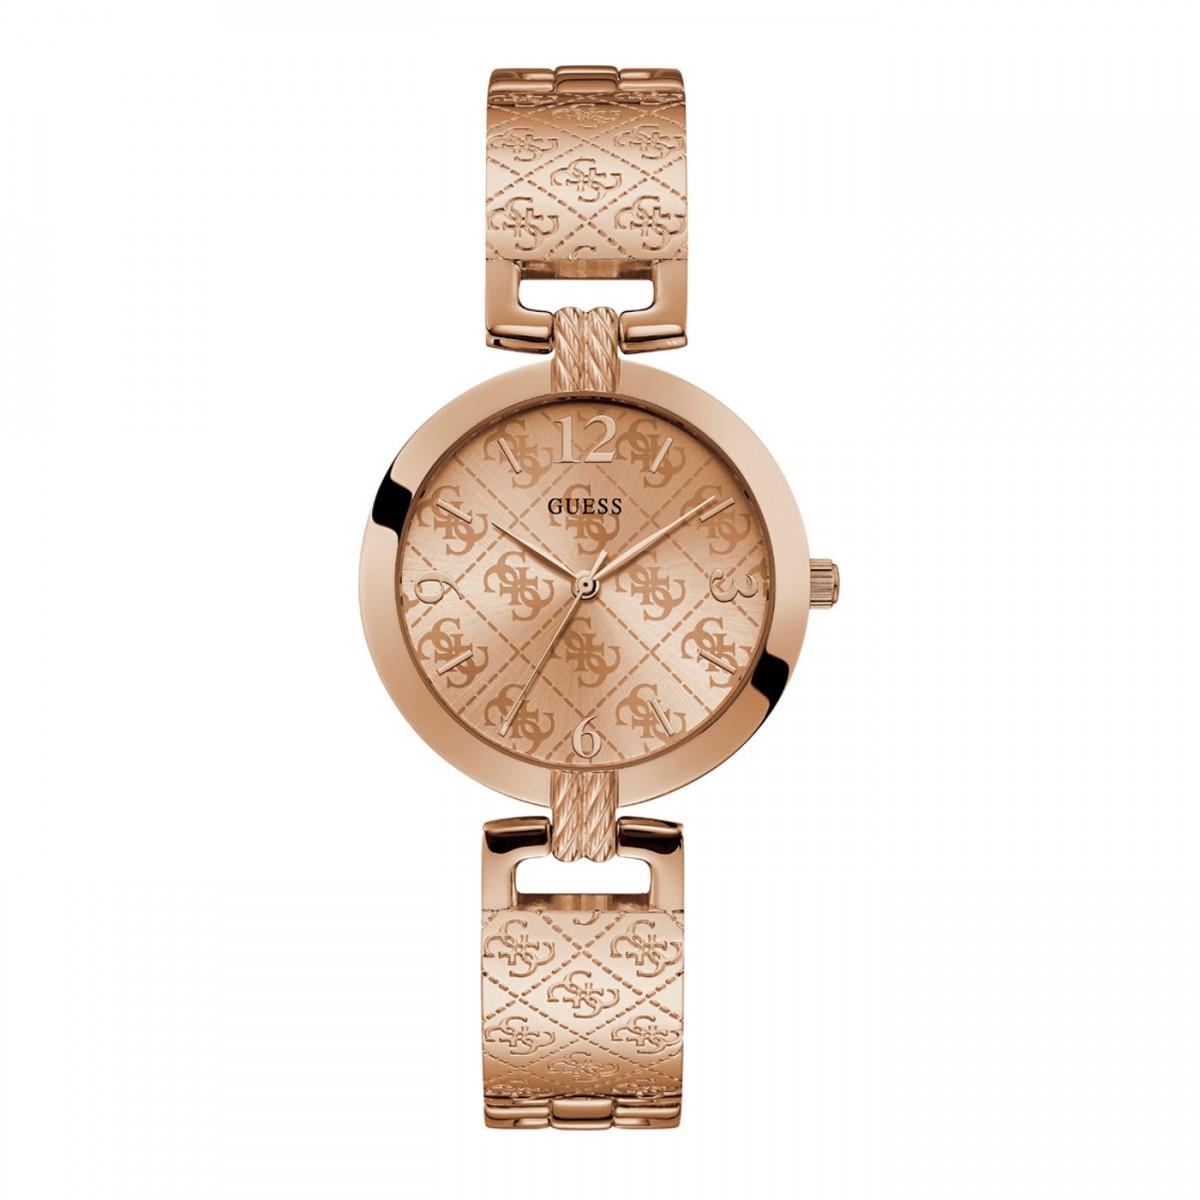 Luxe Reloj G Joyería Guess Gaber 9YHEWD2I